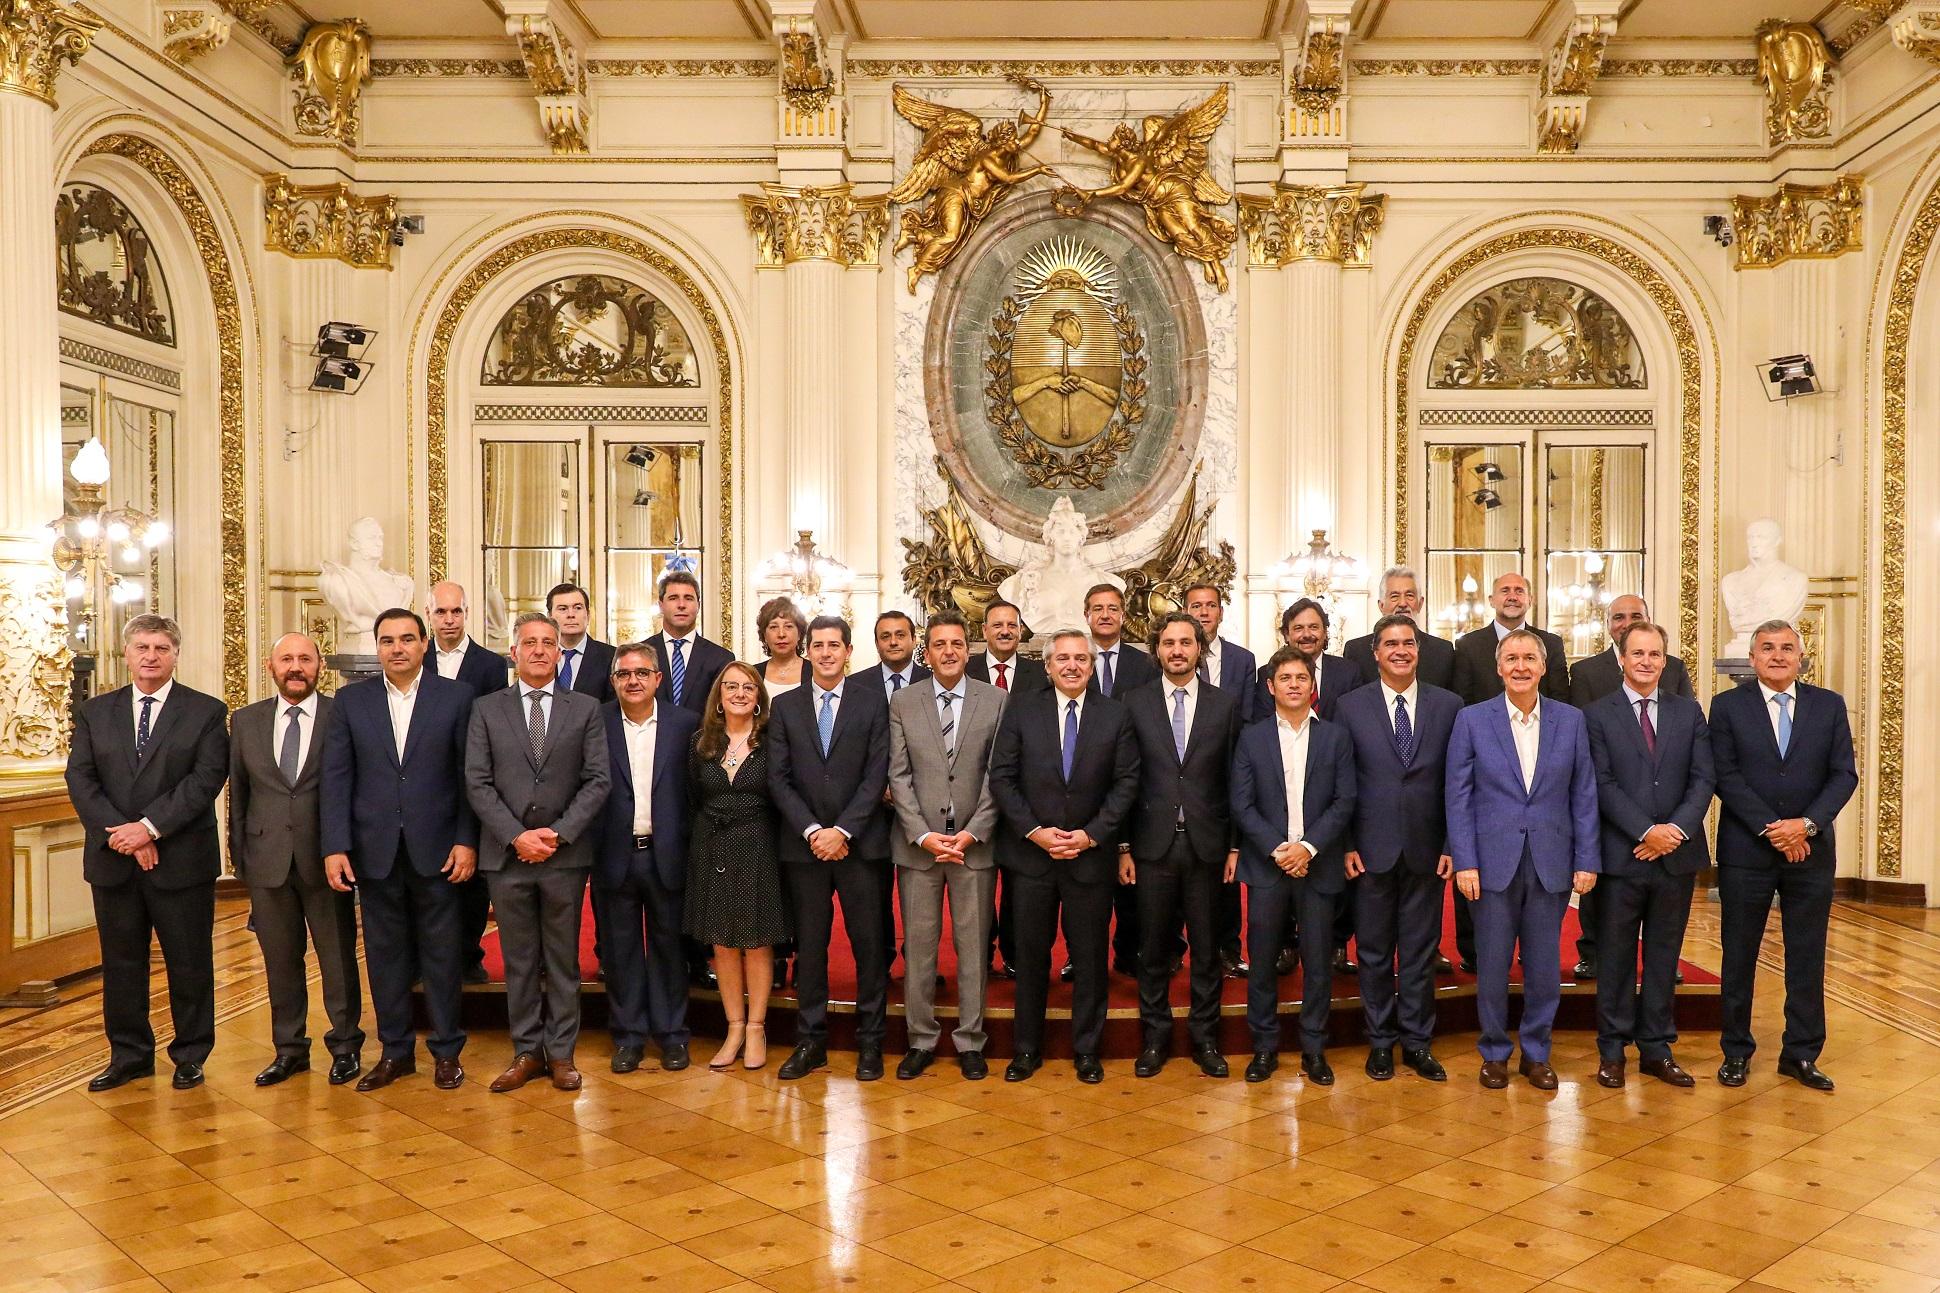 Resultado de imagen para argentina gobernadores